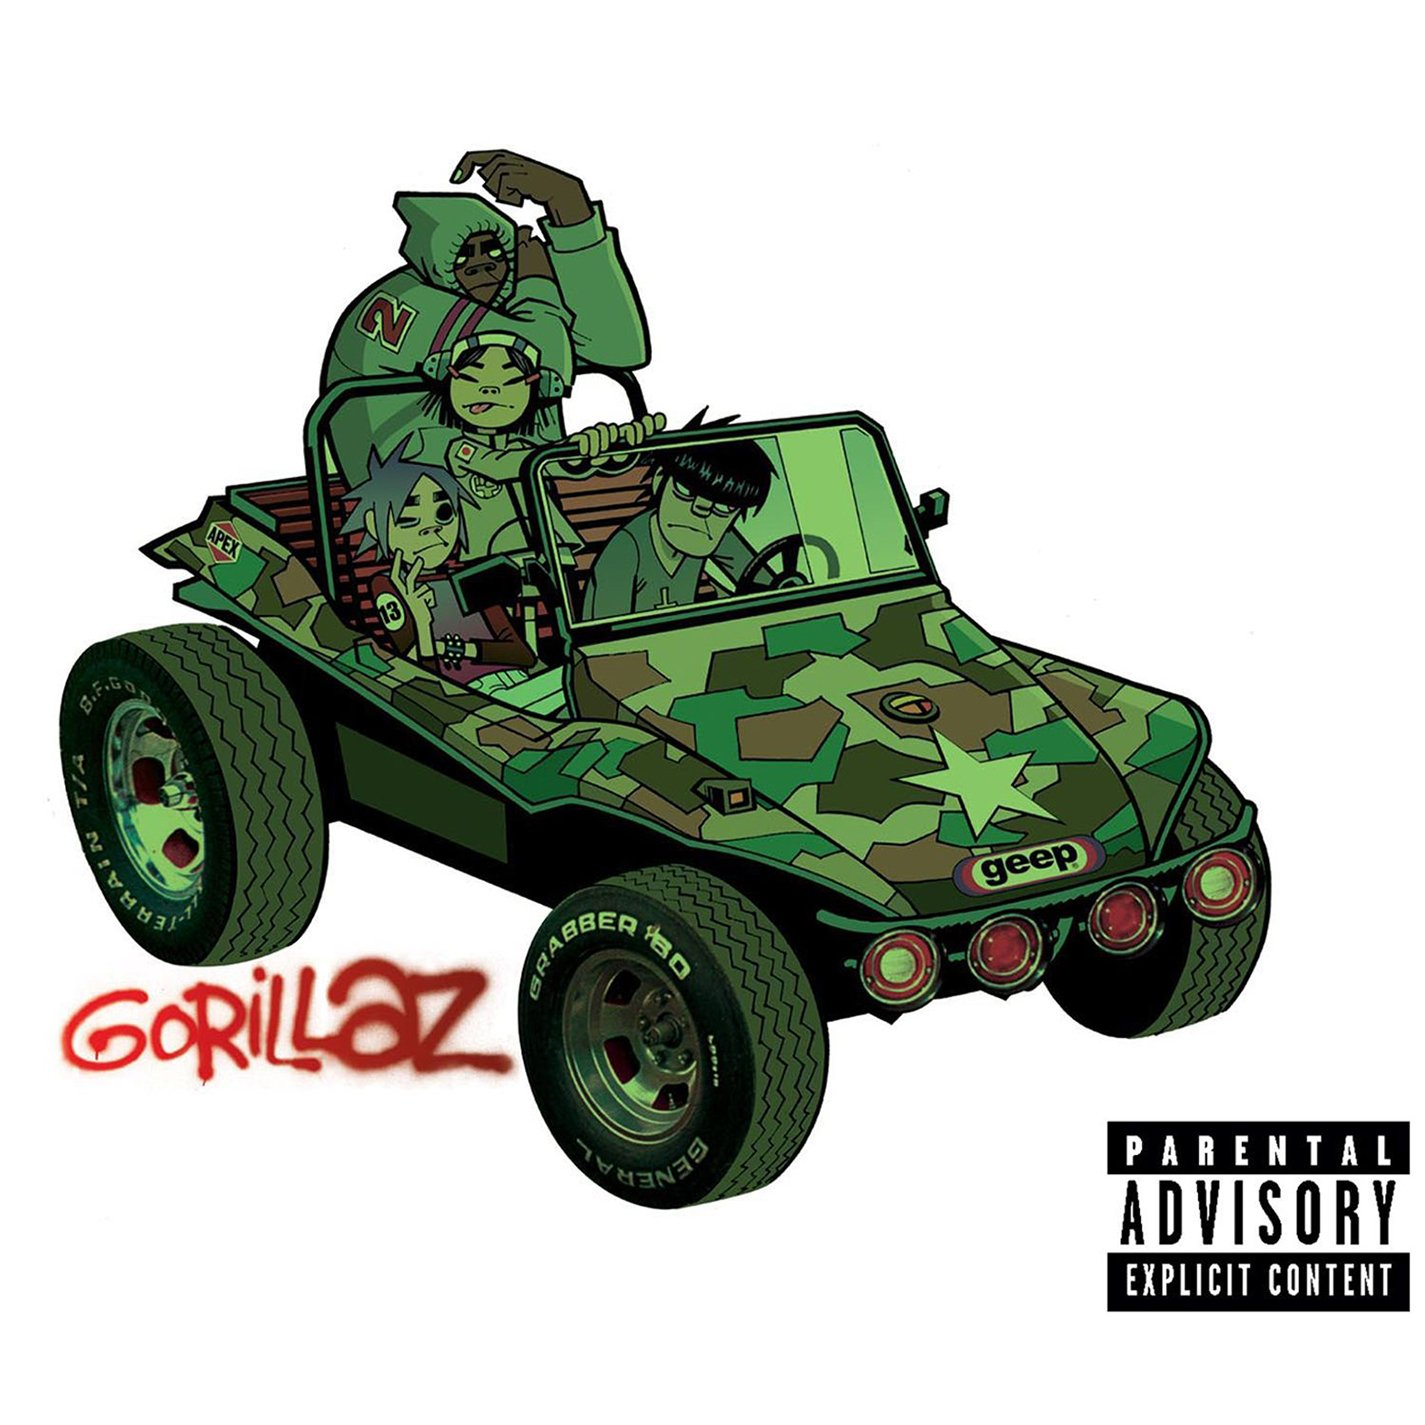 Gorillaz by Wb / Parlophone